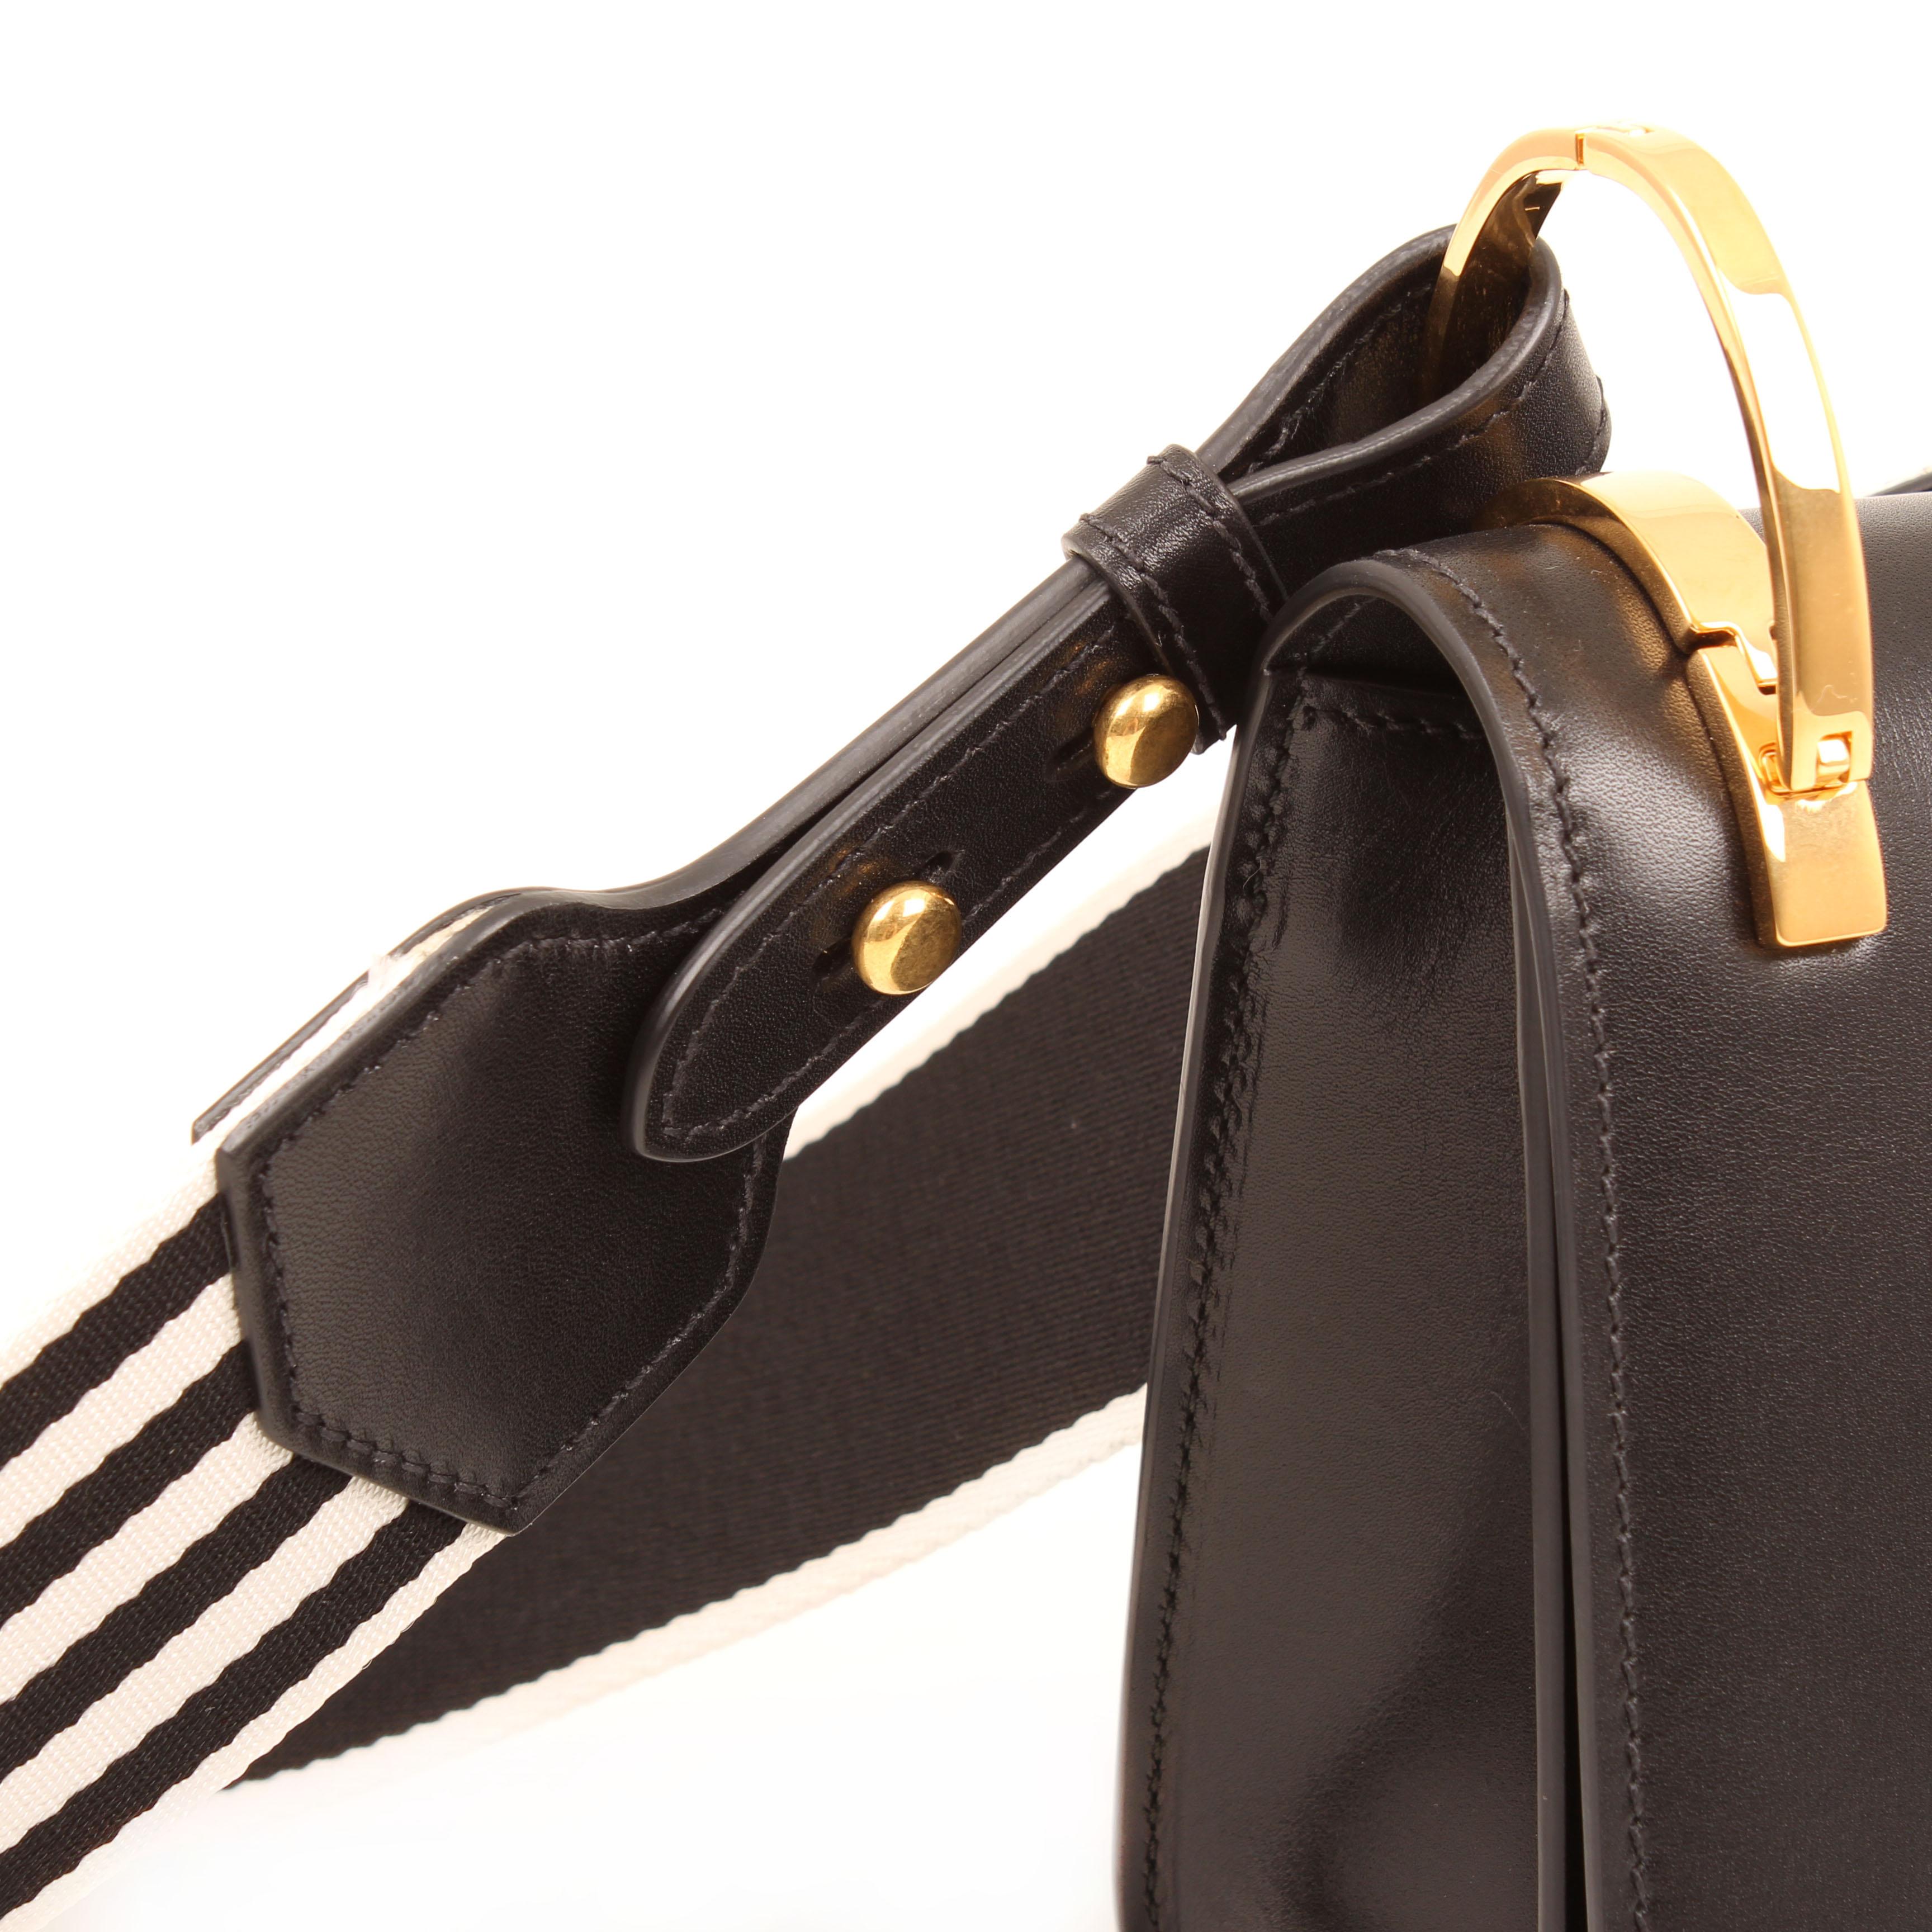 bolso al hombro prada pionniere cuero vitello negro detalle bandolera argolla